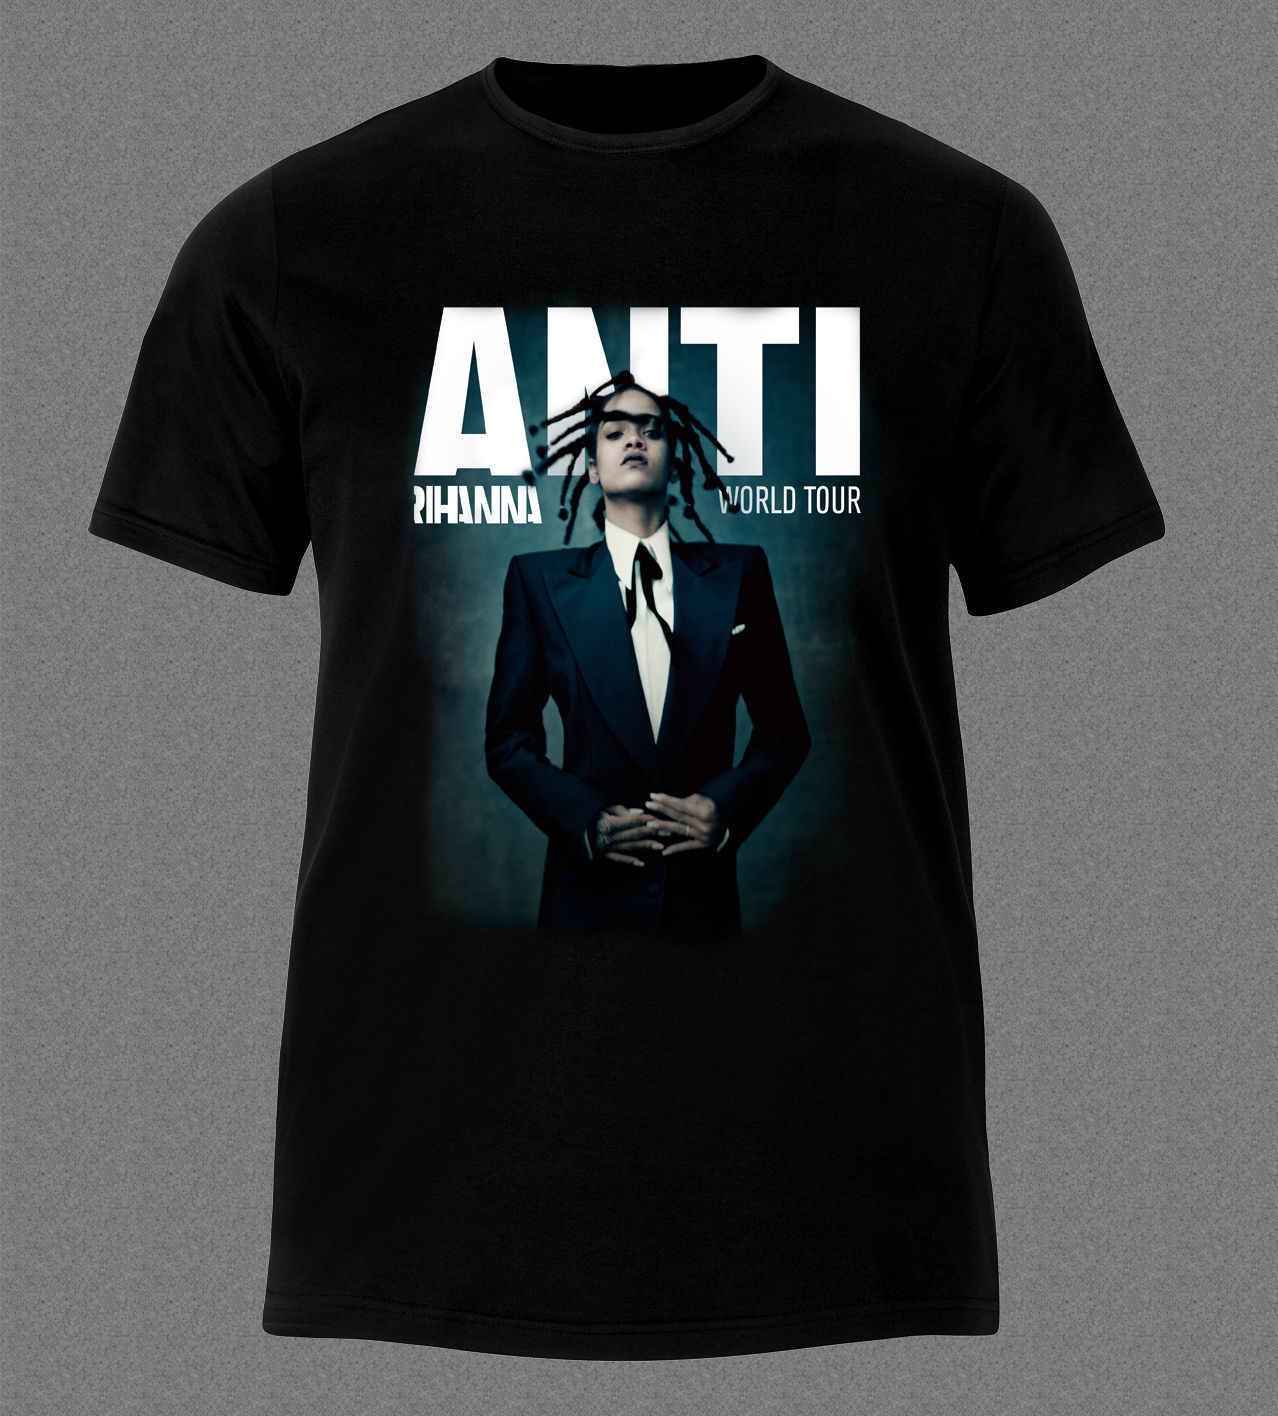 955b8a3d6 RIHANNA ANTI MUSIC POP R&B REGGAE DANCE HALL SINGER WORLD TOUR T-Shirt T-